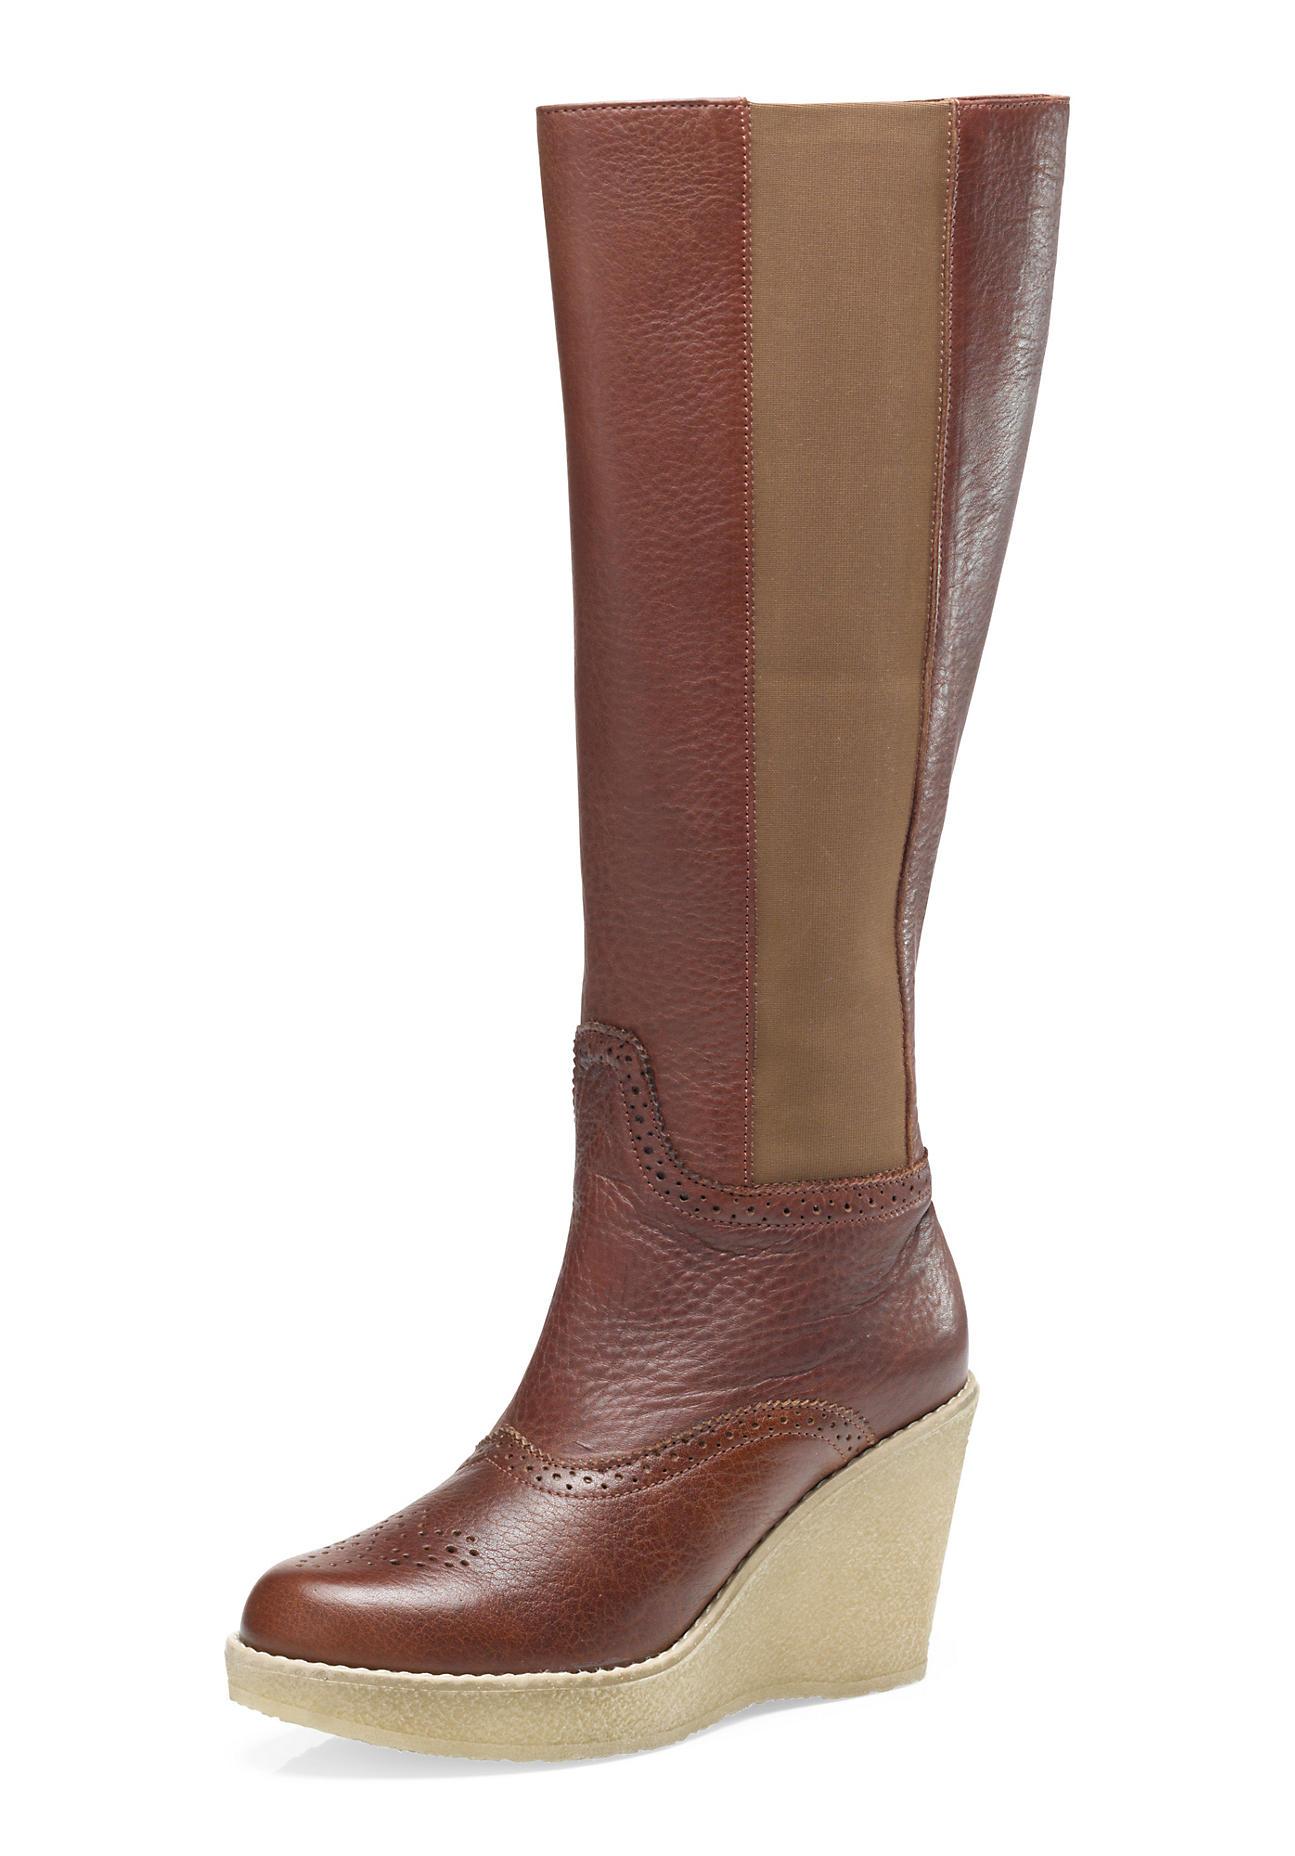 hessnatur Damen Stiefel aus Leder